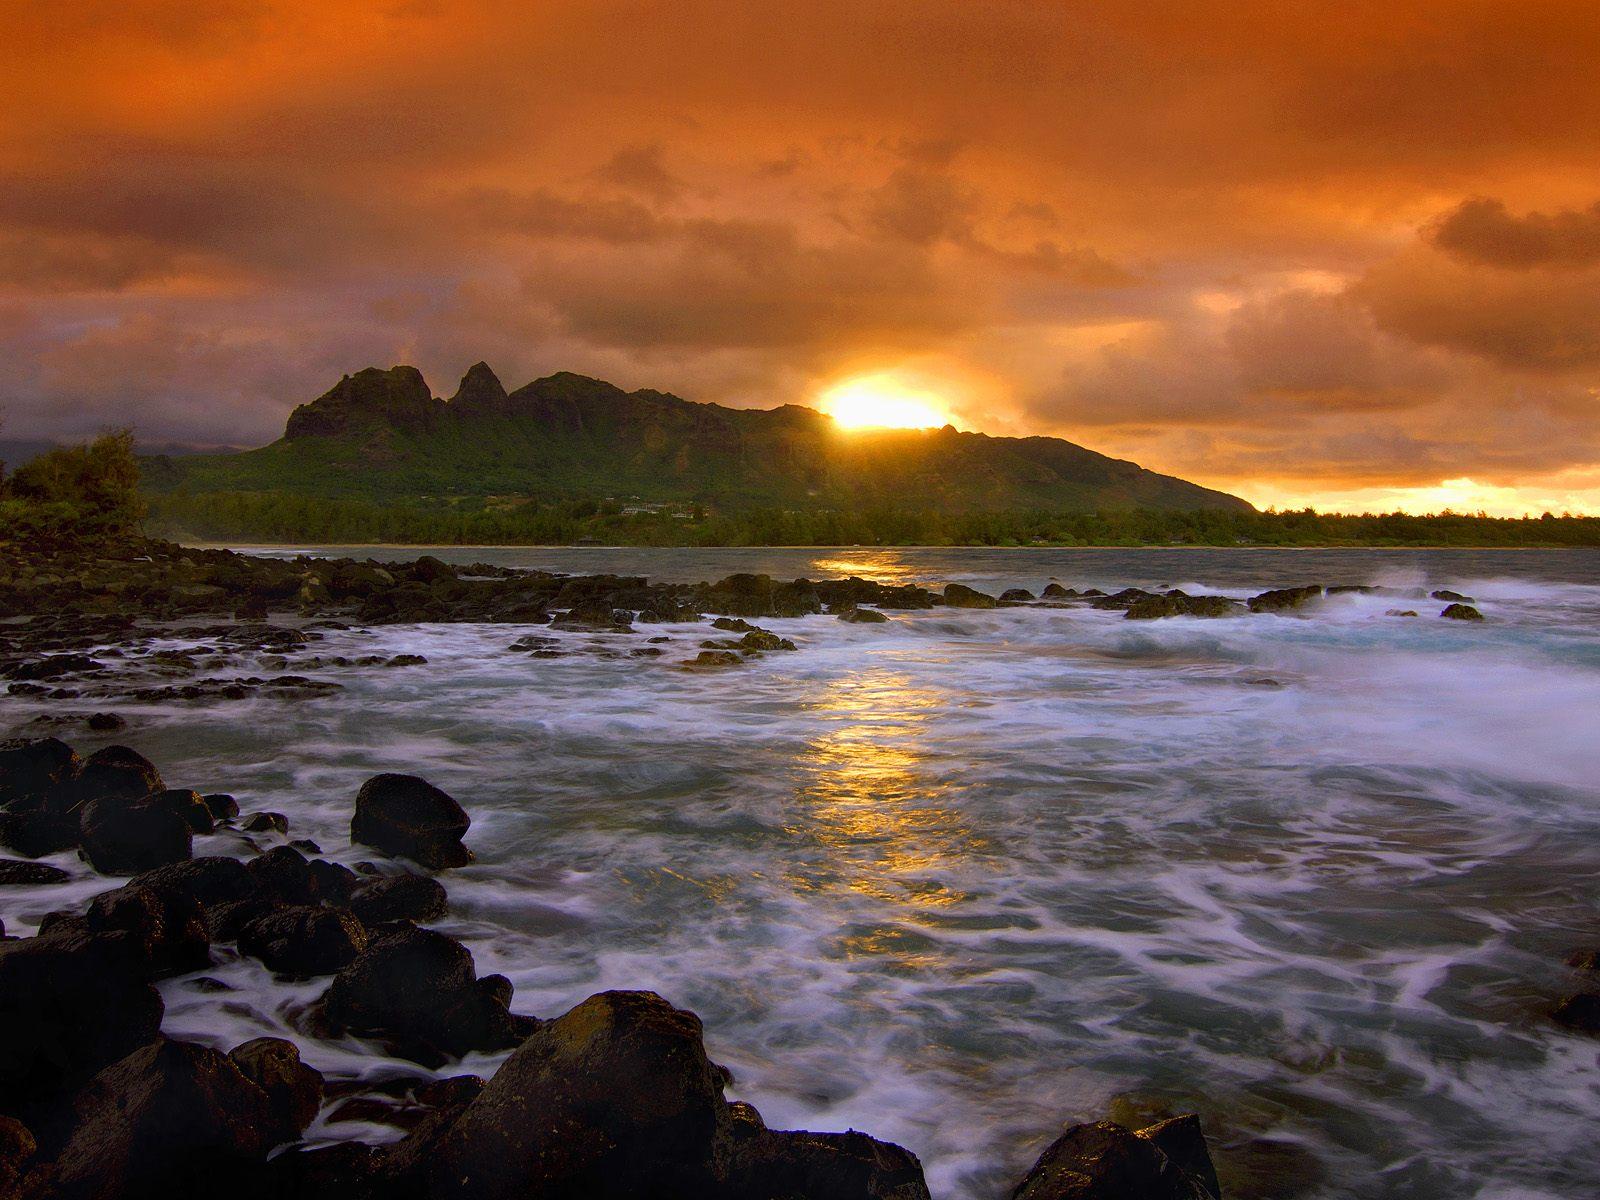 Island Seascape Kauai Hawaii wallpaper 1600x1200